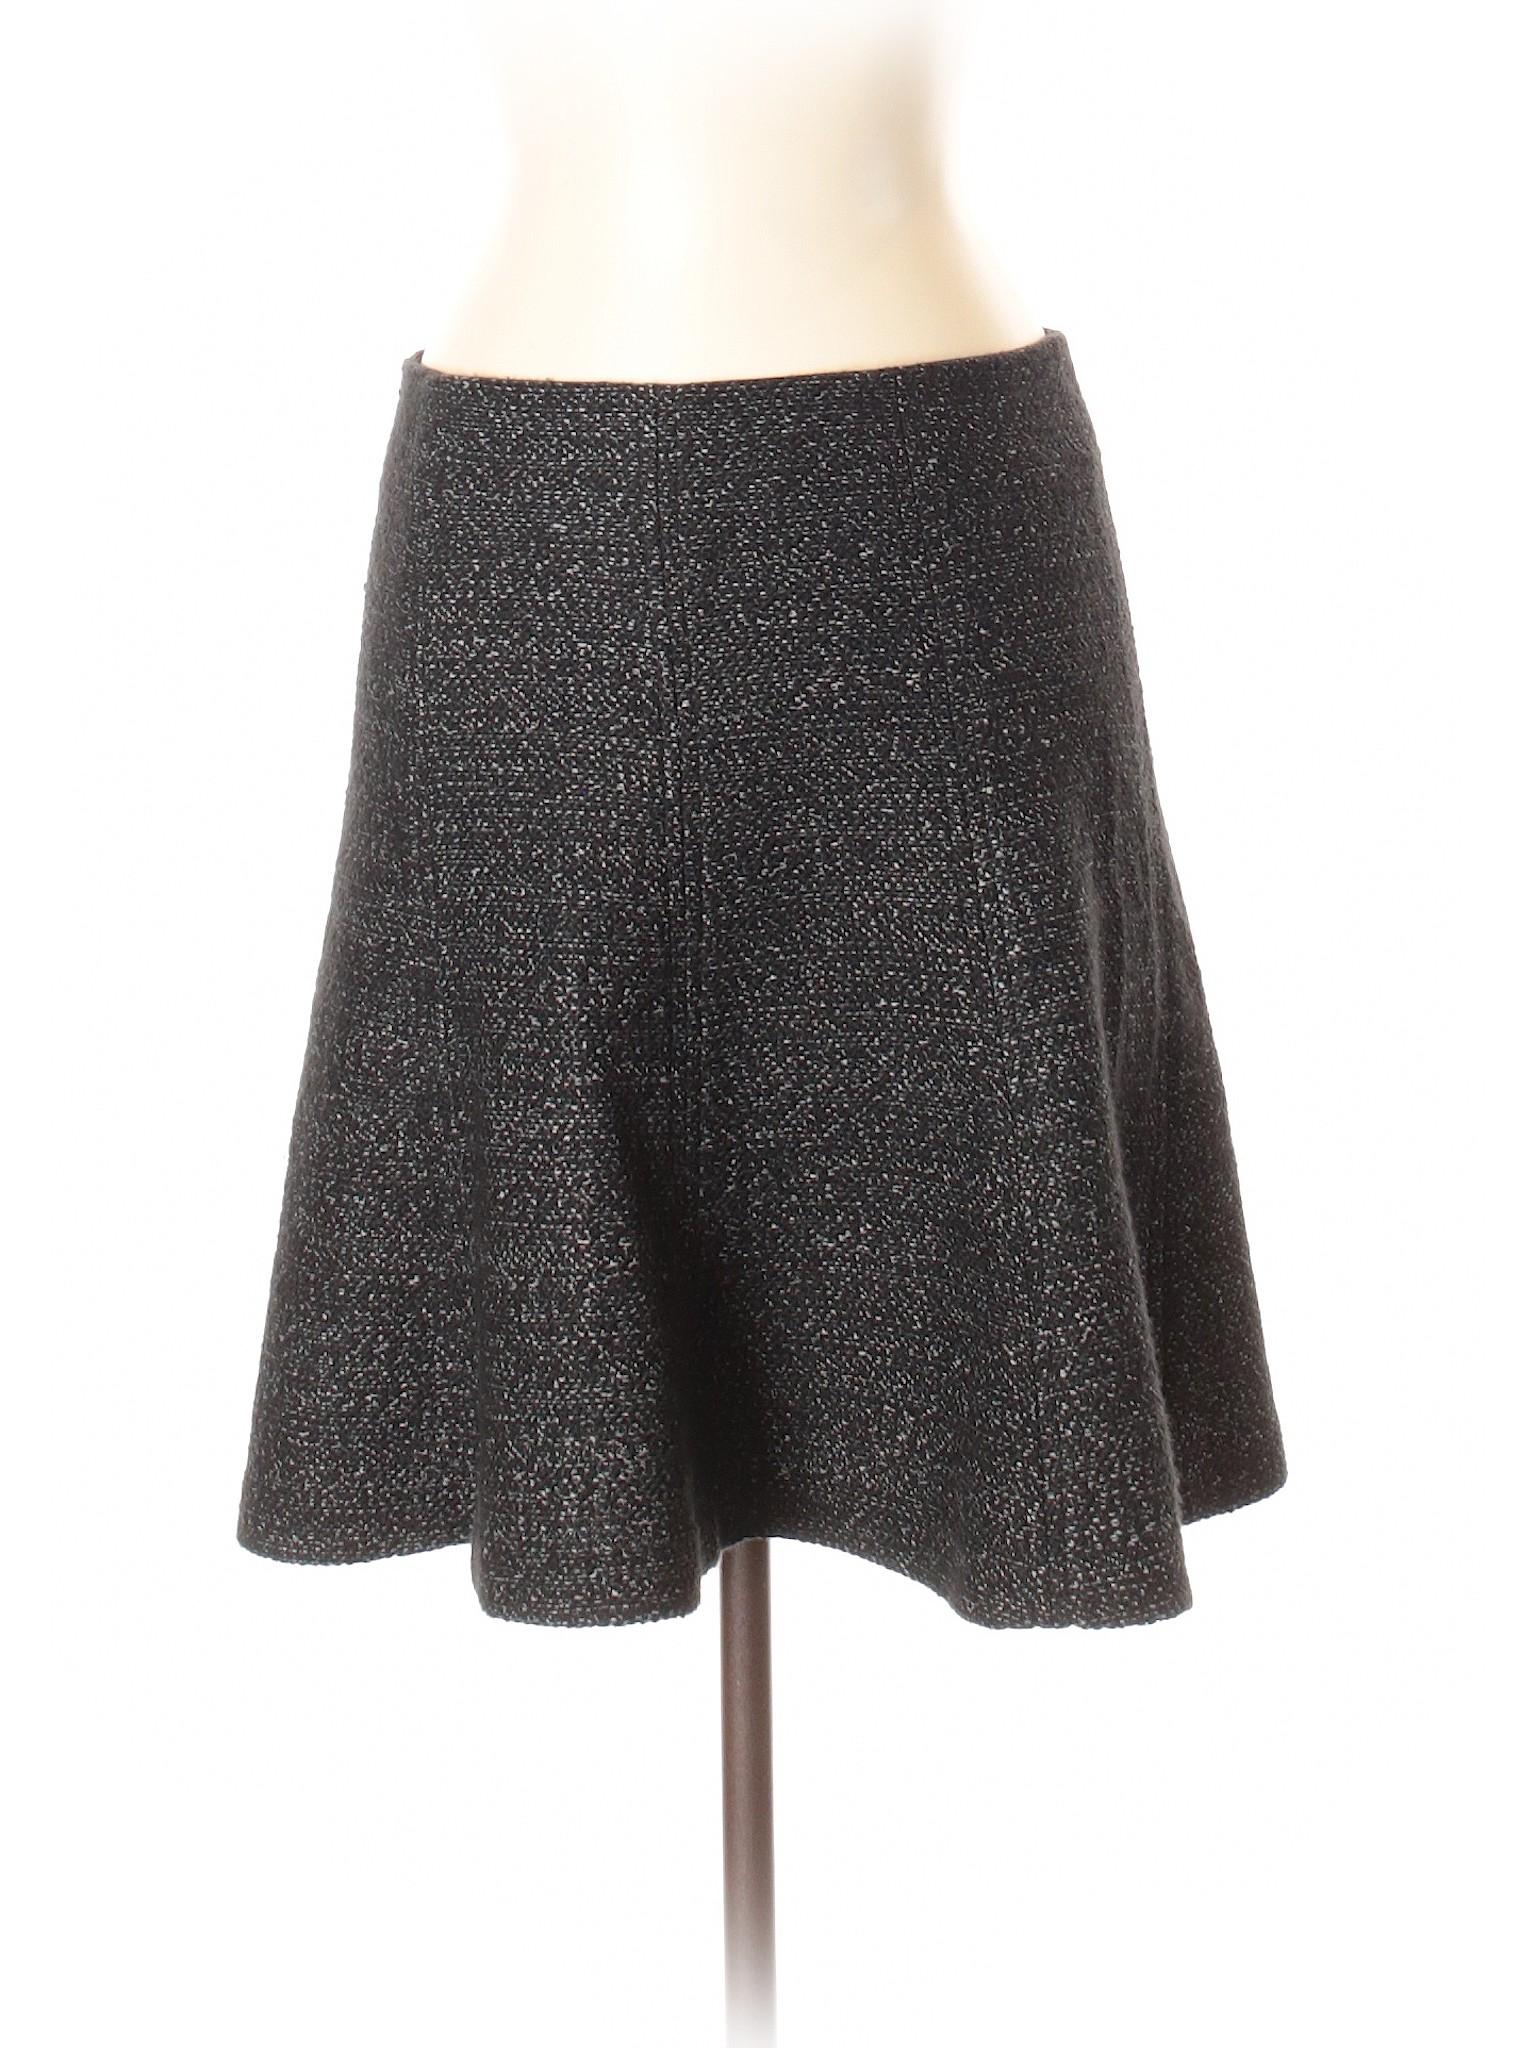 leisure LOFT Skirt Ann Taylor Casual Boutique 6xg7wdq7